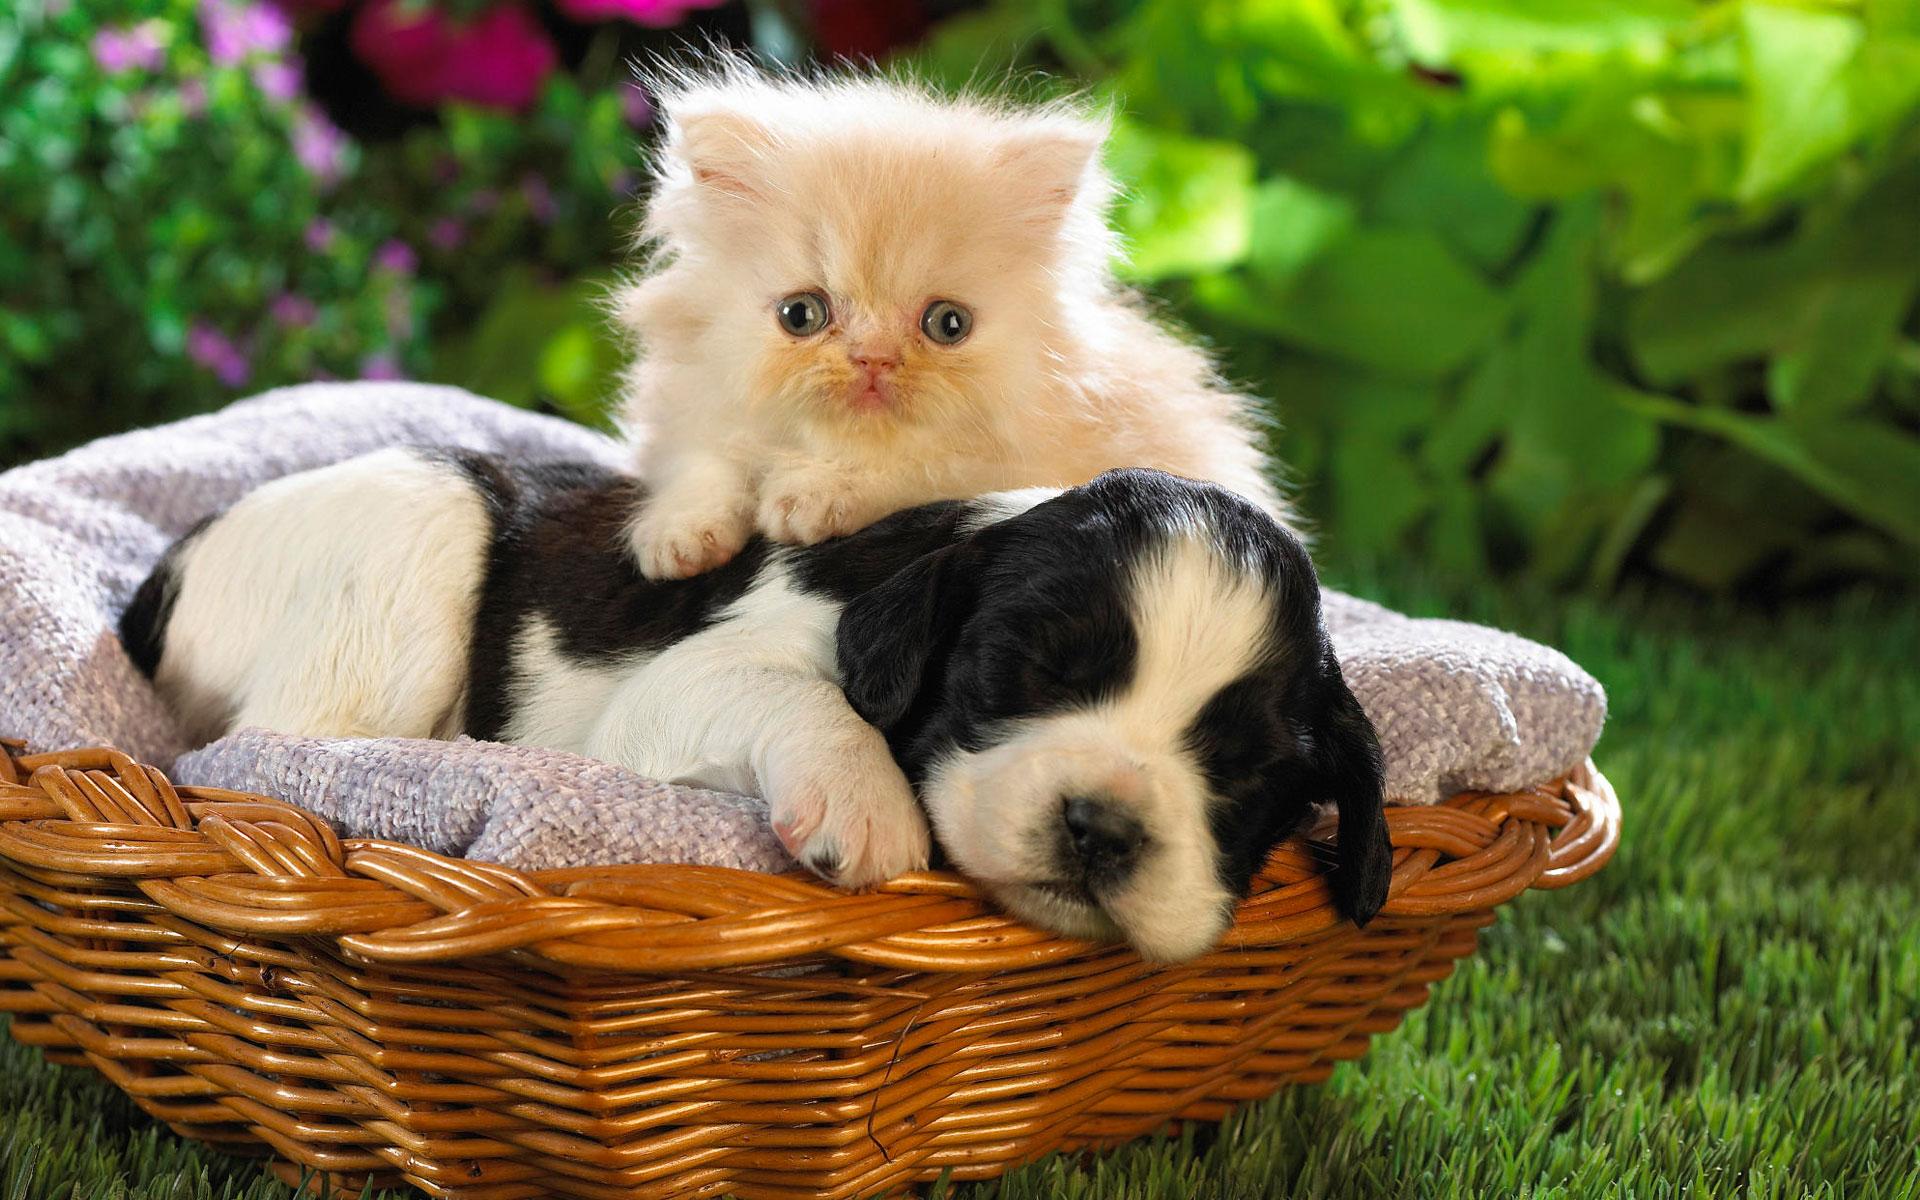 Baby Animal Pictures Cute Puppy Desktop Wallpaper